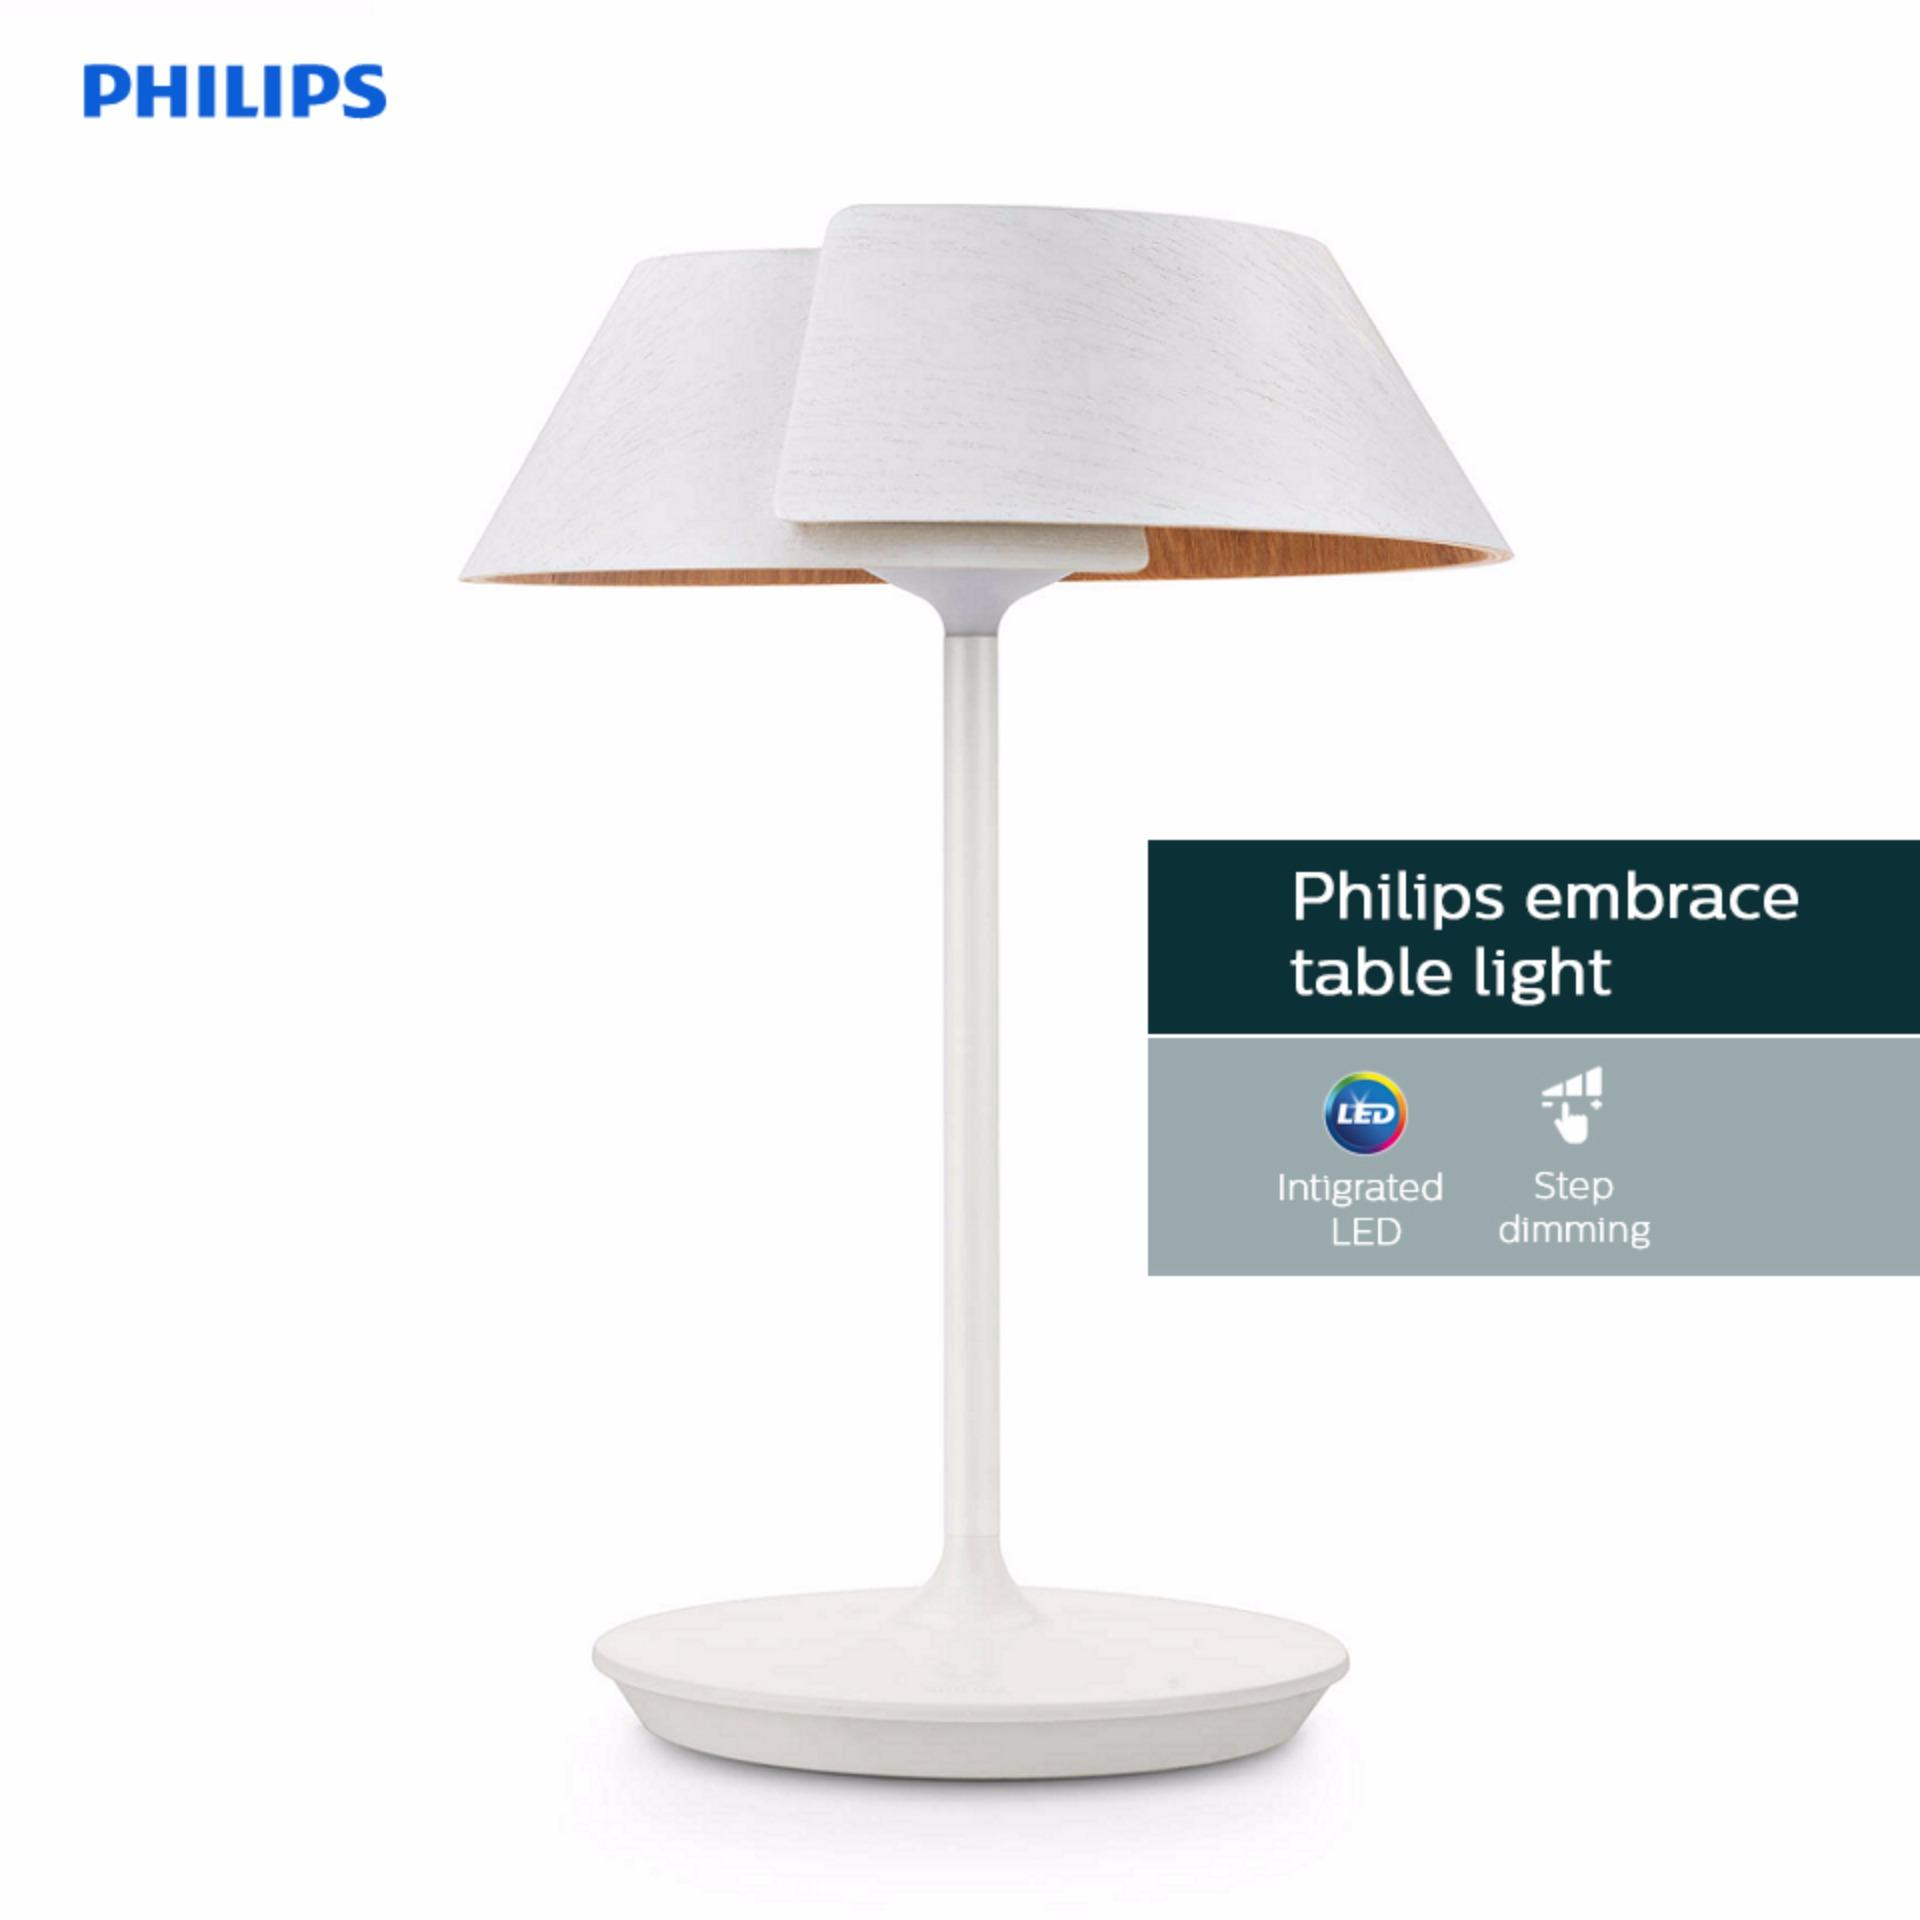 Philips 49023 embrace table lamp led white singapore philips 49023 embrace table lamp led white geotapseo Gallery